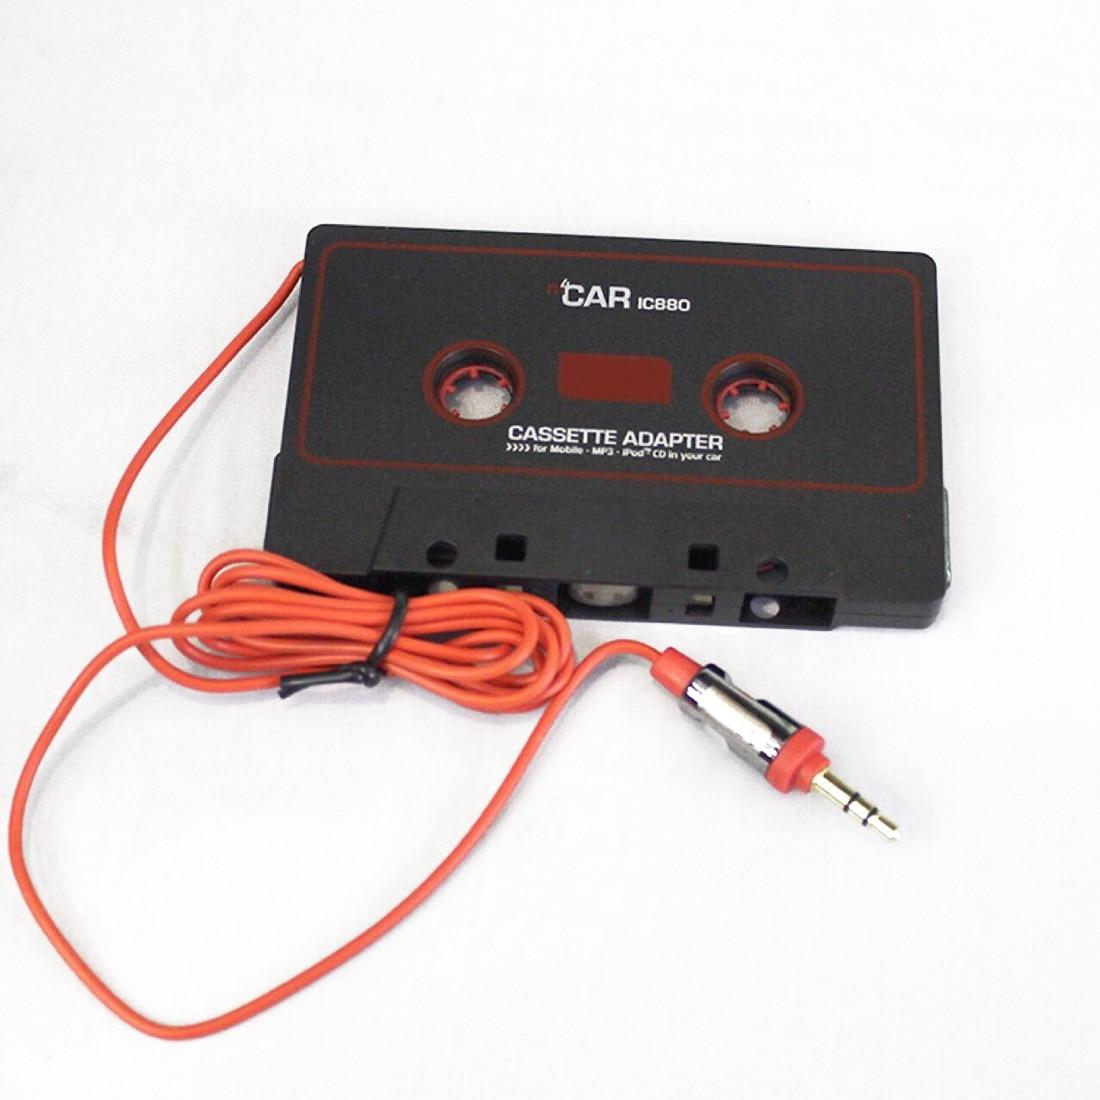 marsnaska car cassette tape adapter cassette mp3 player. Black Bedroom Furniture Sets. Home Design Ideas